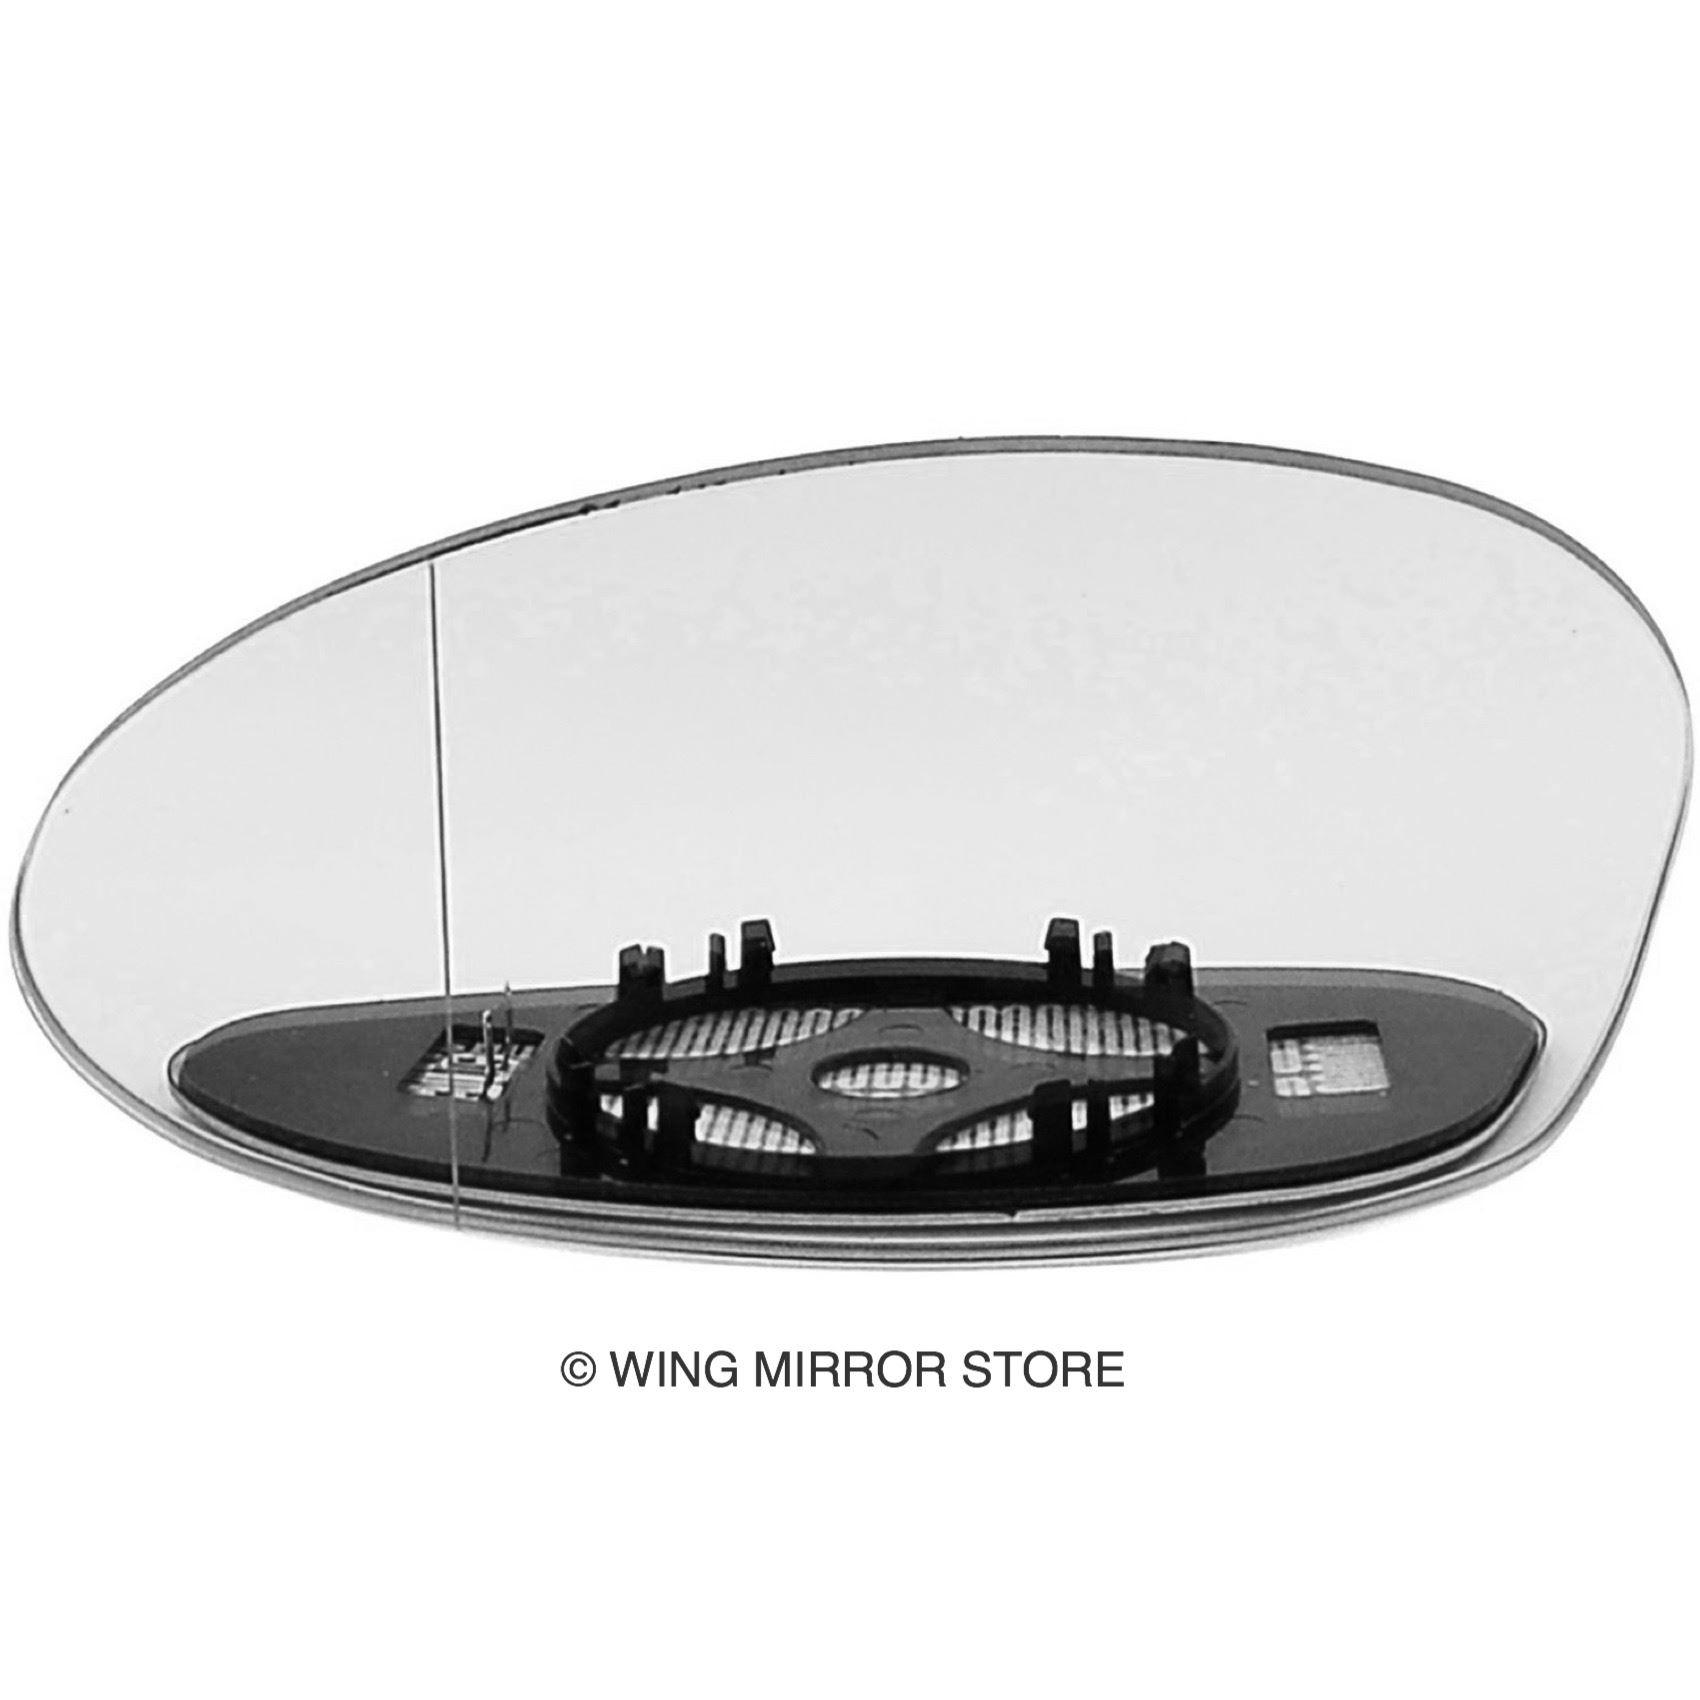 BMW 3 Series E90 Saloon 2008-2012 Heated Aspherical Mirror Glass Passenger Side